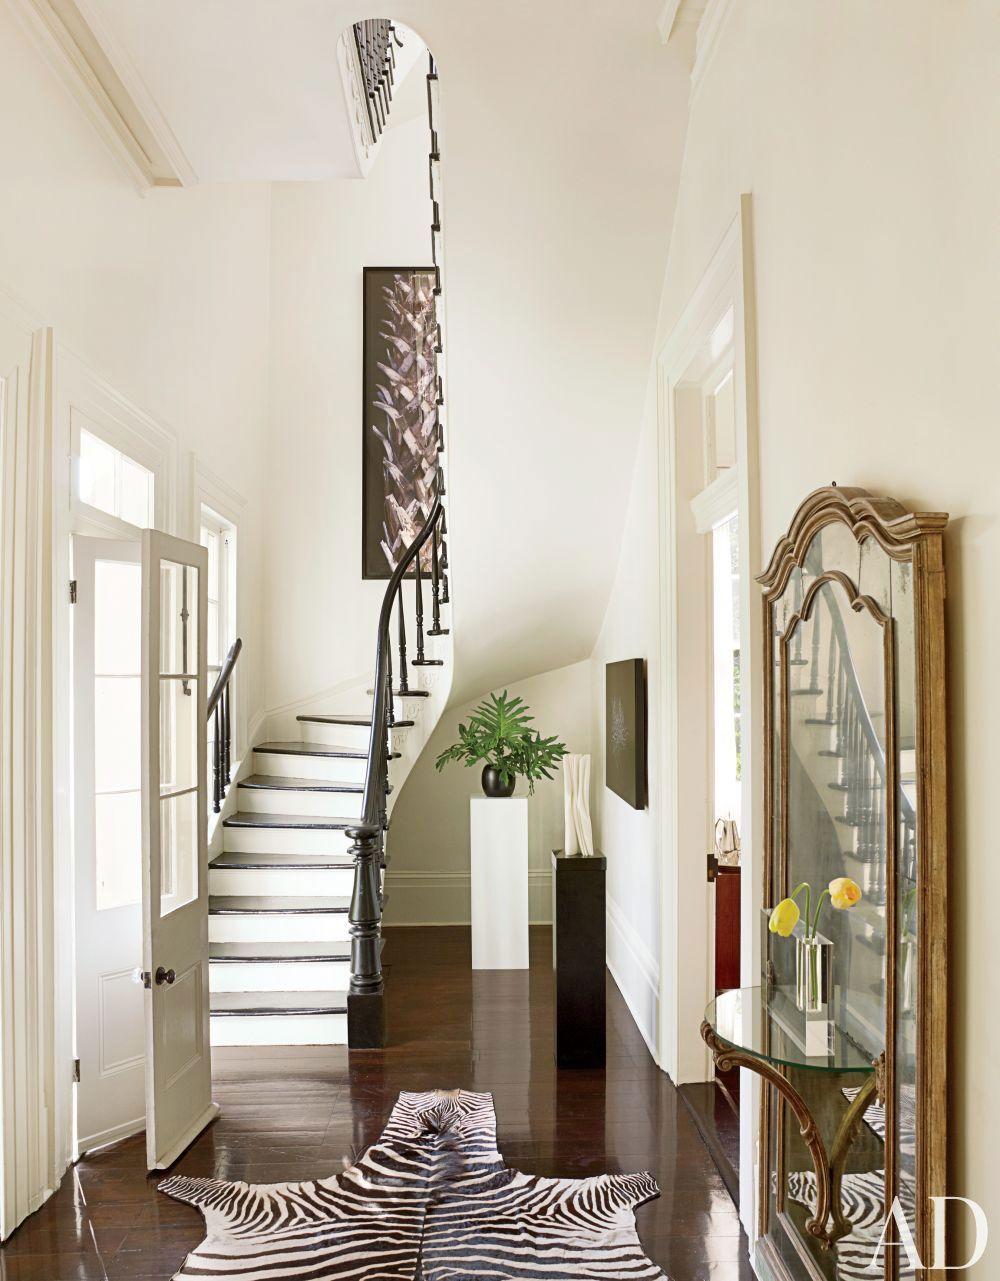 Modern hallway furniture ideas  Hallway Wall Decorating Ideas For Your Comfy Home  Home Hallways